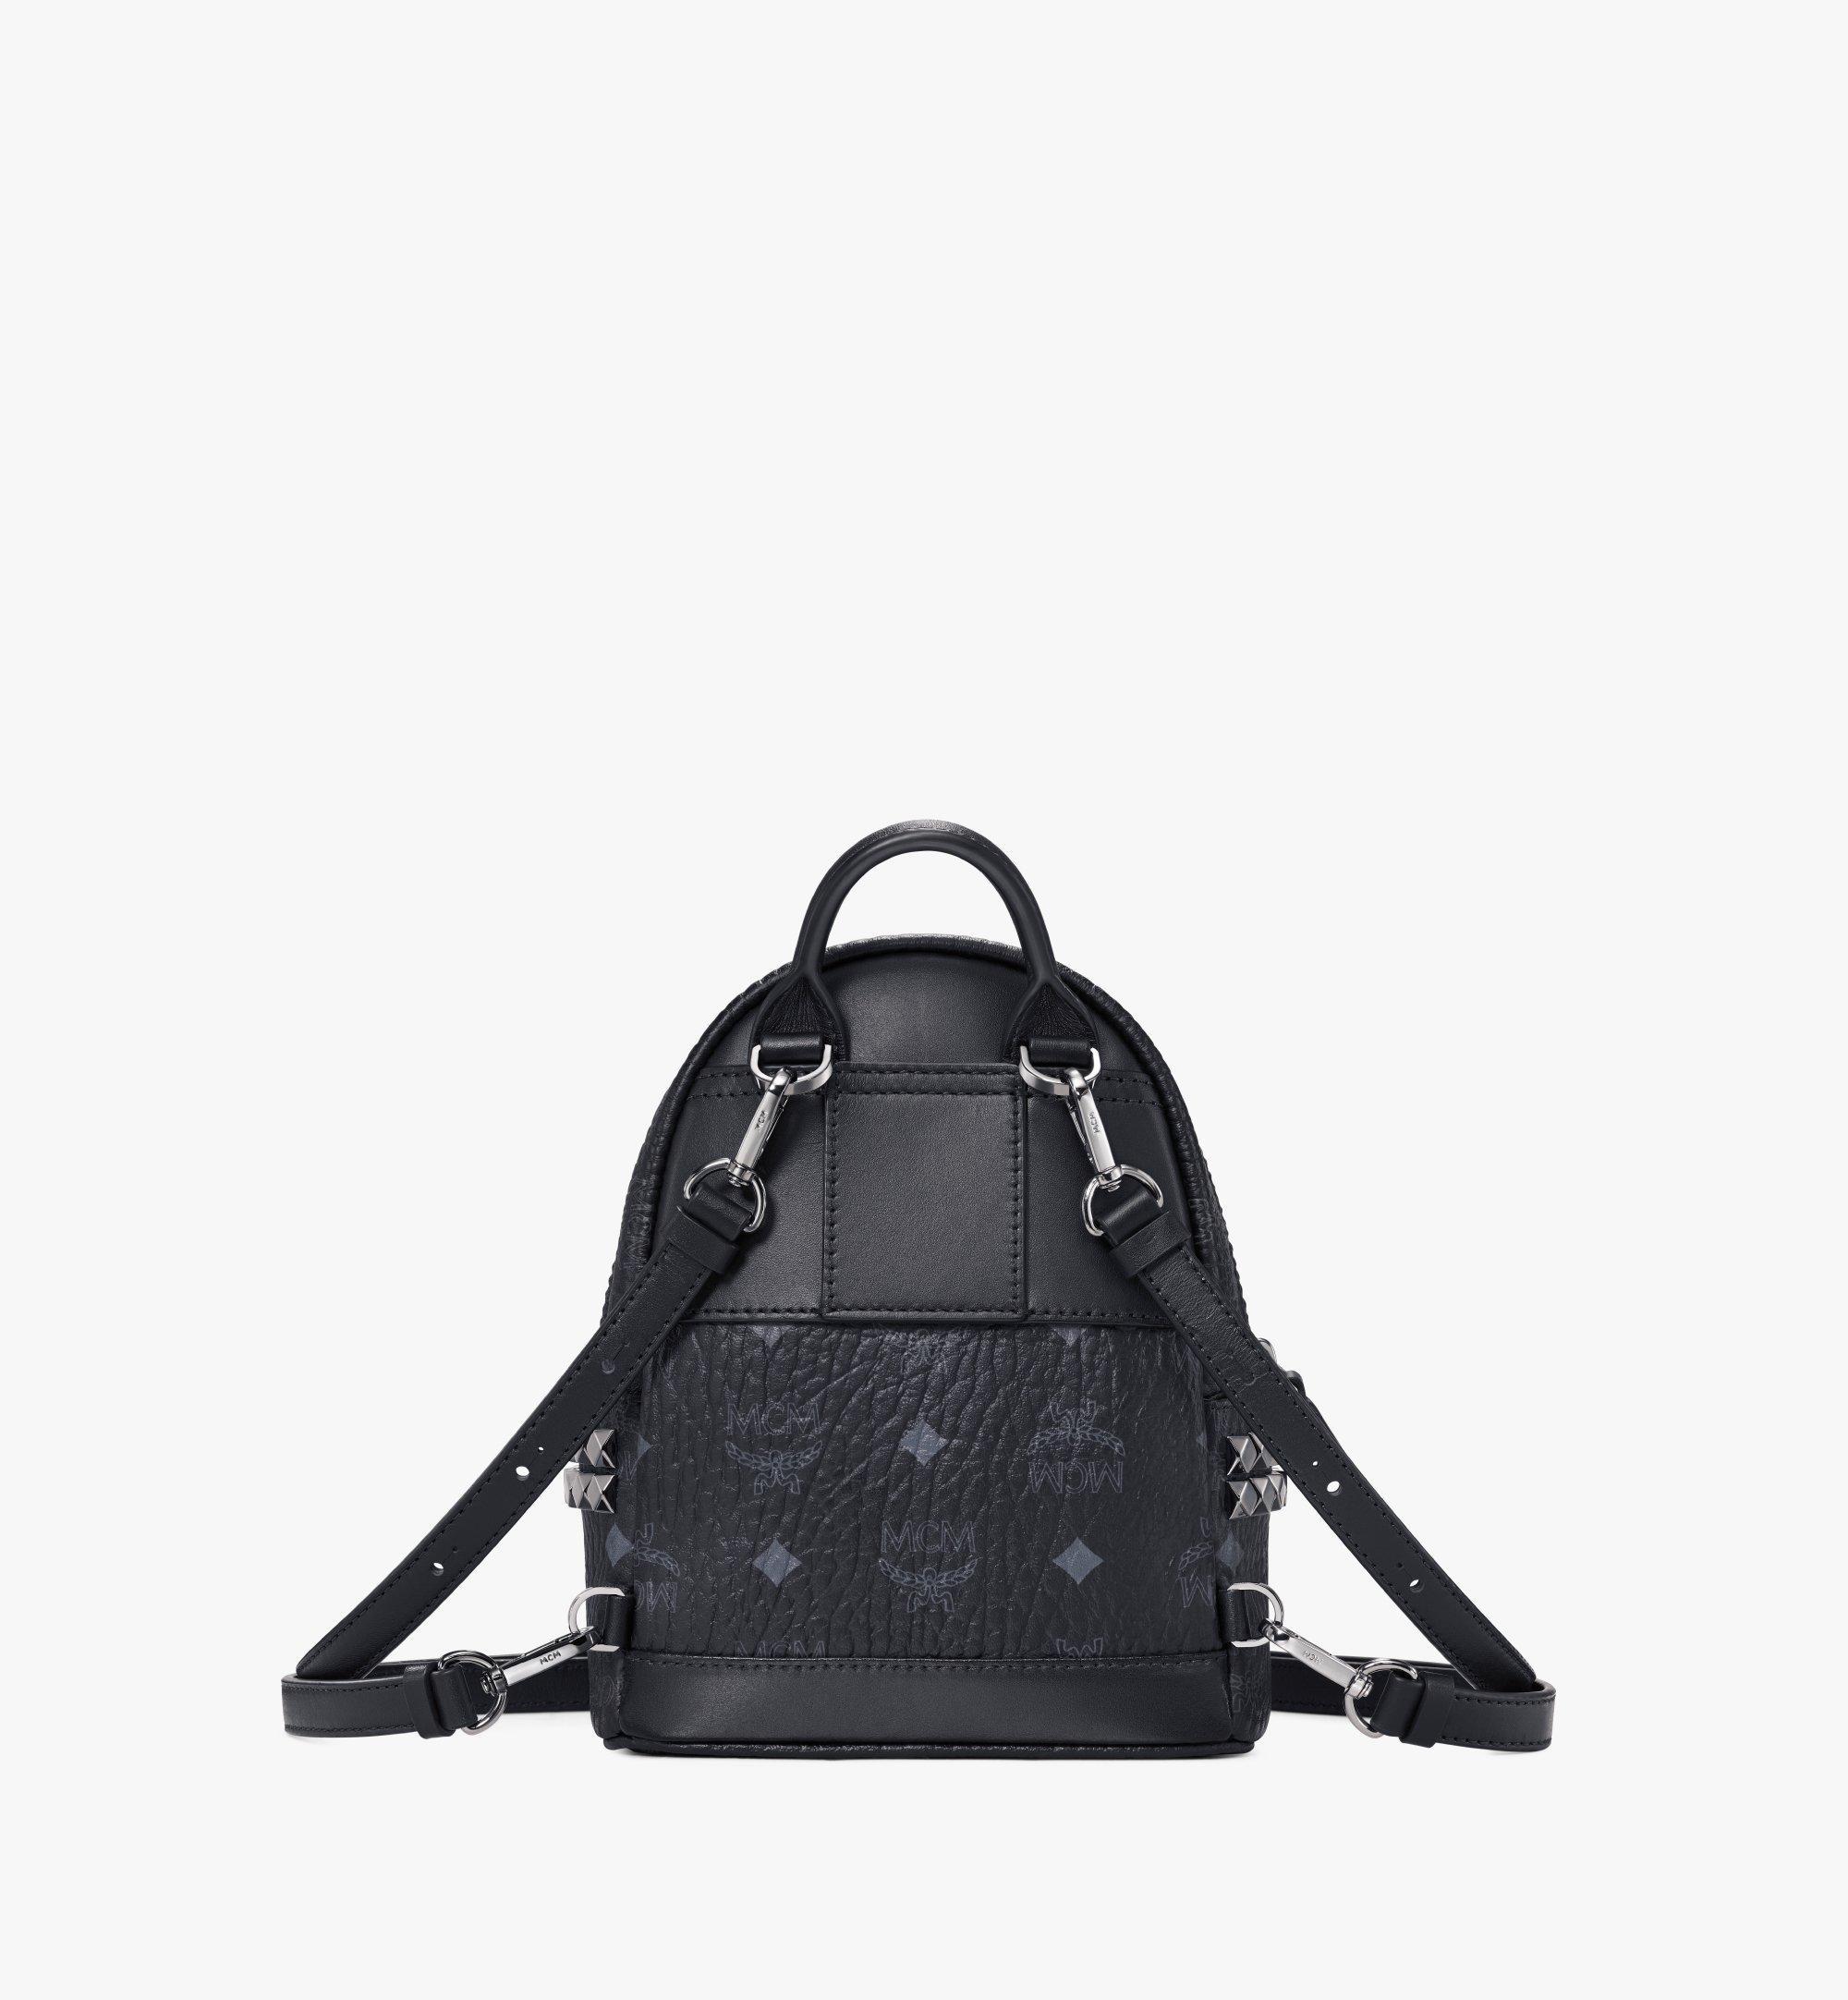 MCM Stark Bebe Boo Backpack in Visetos Black MMK6SVE92BK001 Alternate View 4